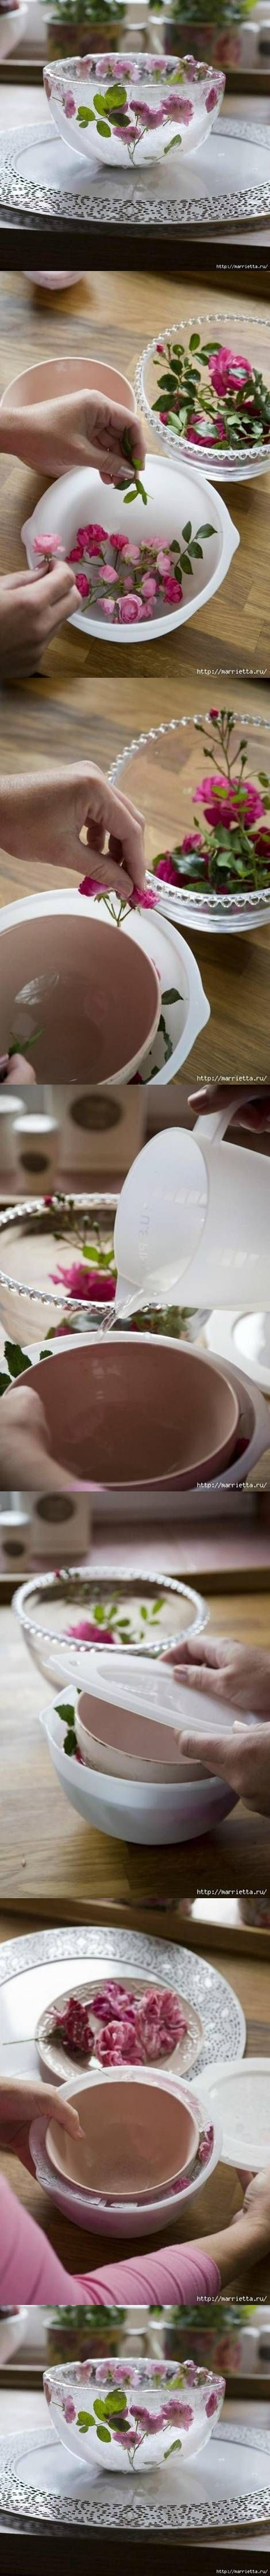 DIY Icy Flower Bowl DIY Projects | UsefulDIY.com Follow us on Facebook ==> https://www.facebook.com/UsefulDiy